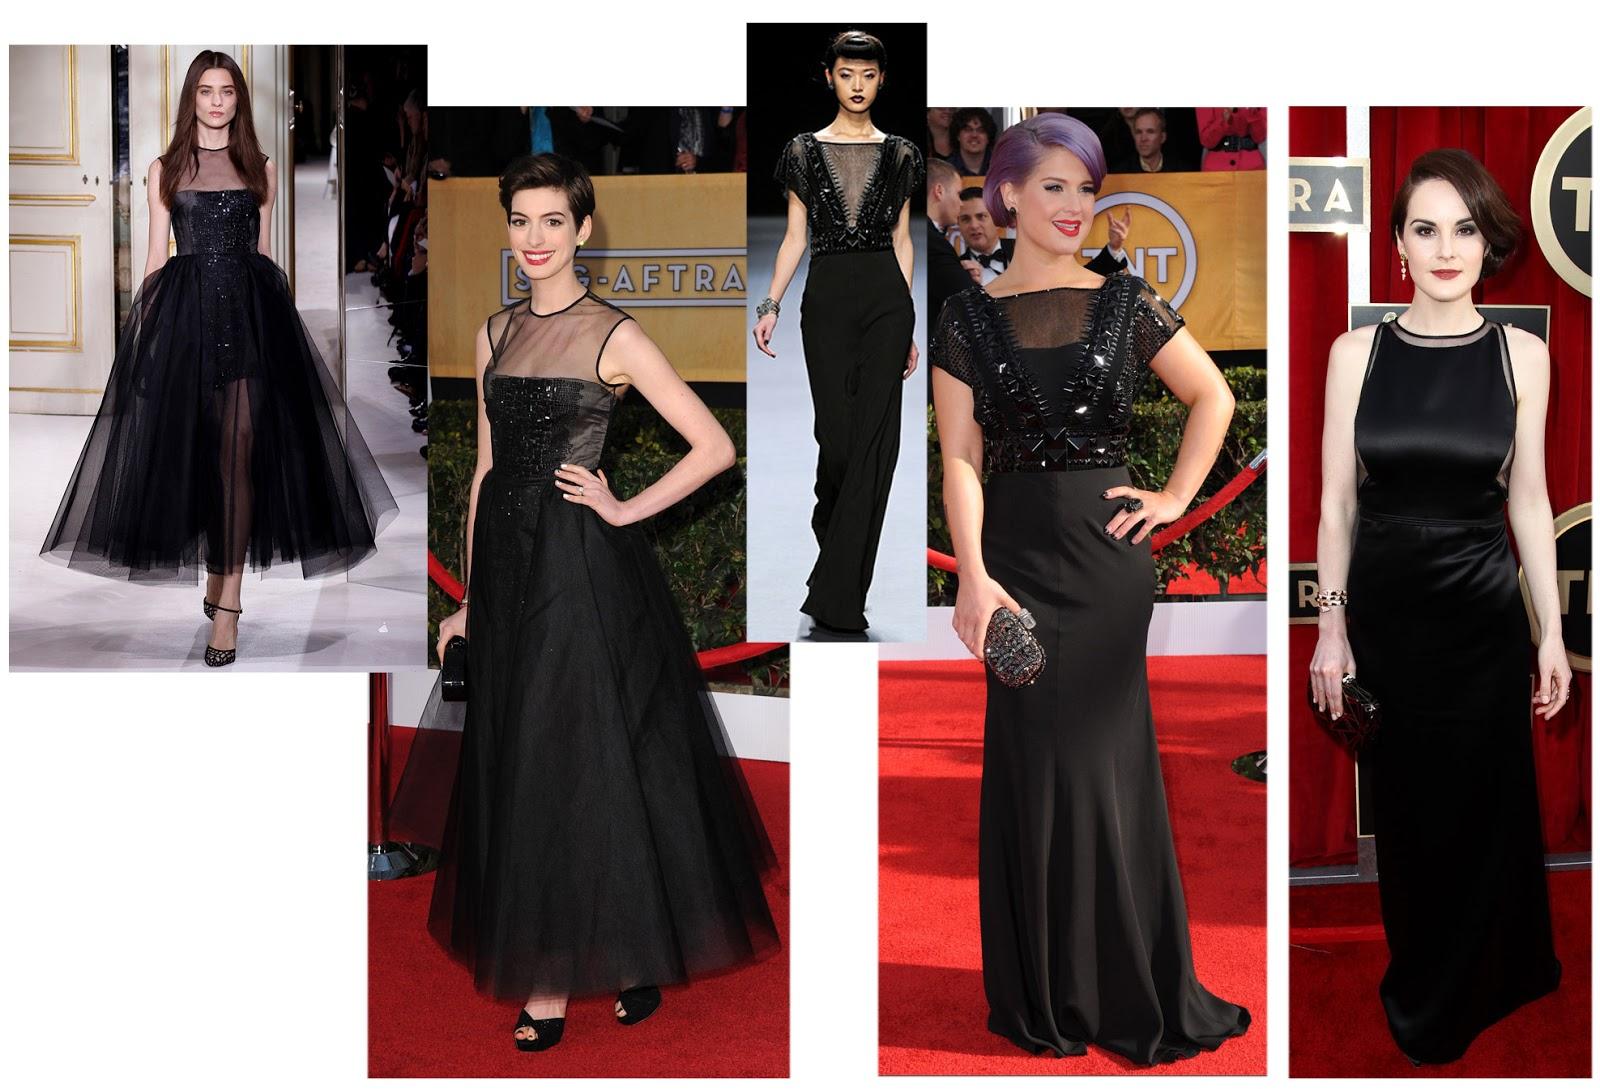 http://3.bp.blogspot.com/-uxxly5nqaYE/UQangMaDAzI/AAAAAAAAF4U/LsUGX73r7uI/s1600/sag+awards+looks+alfombra+roja.jpg